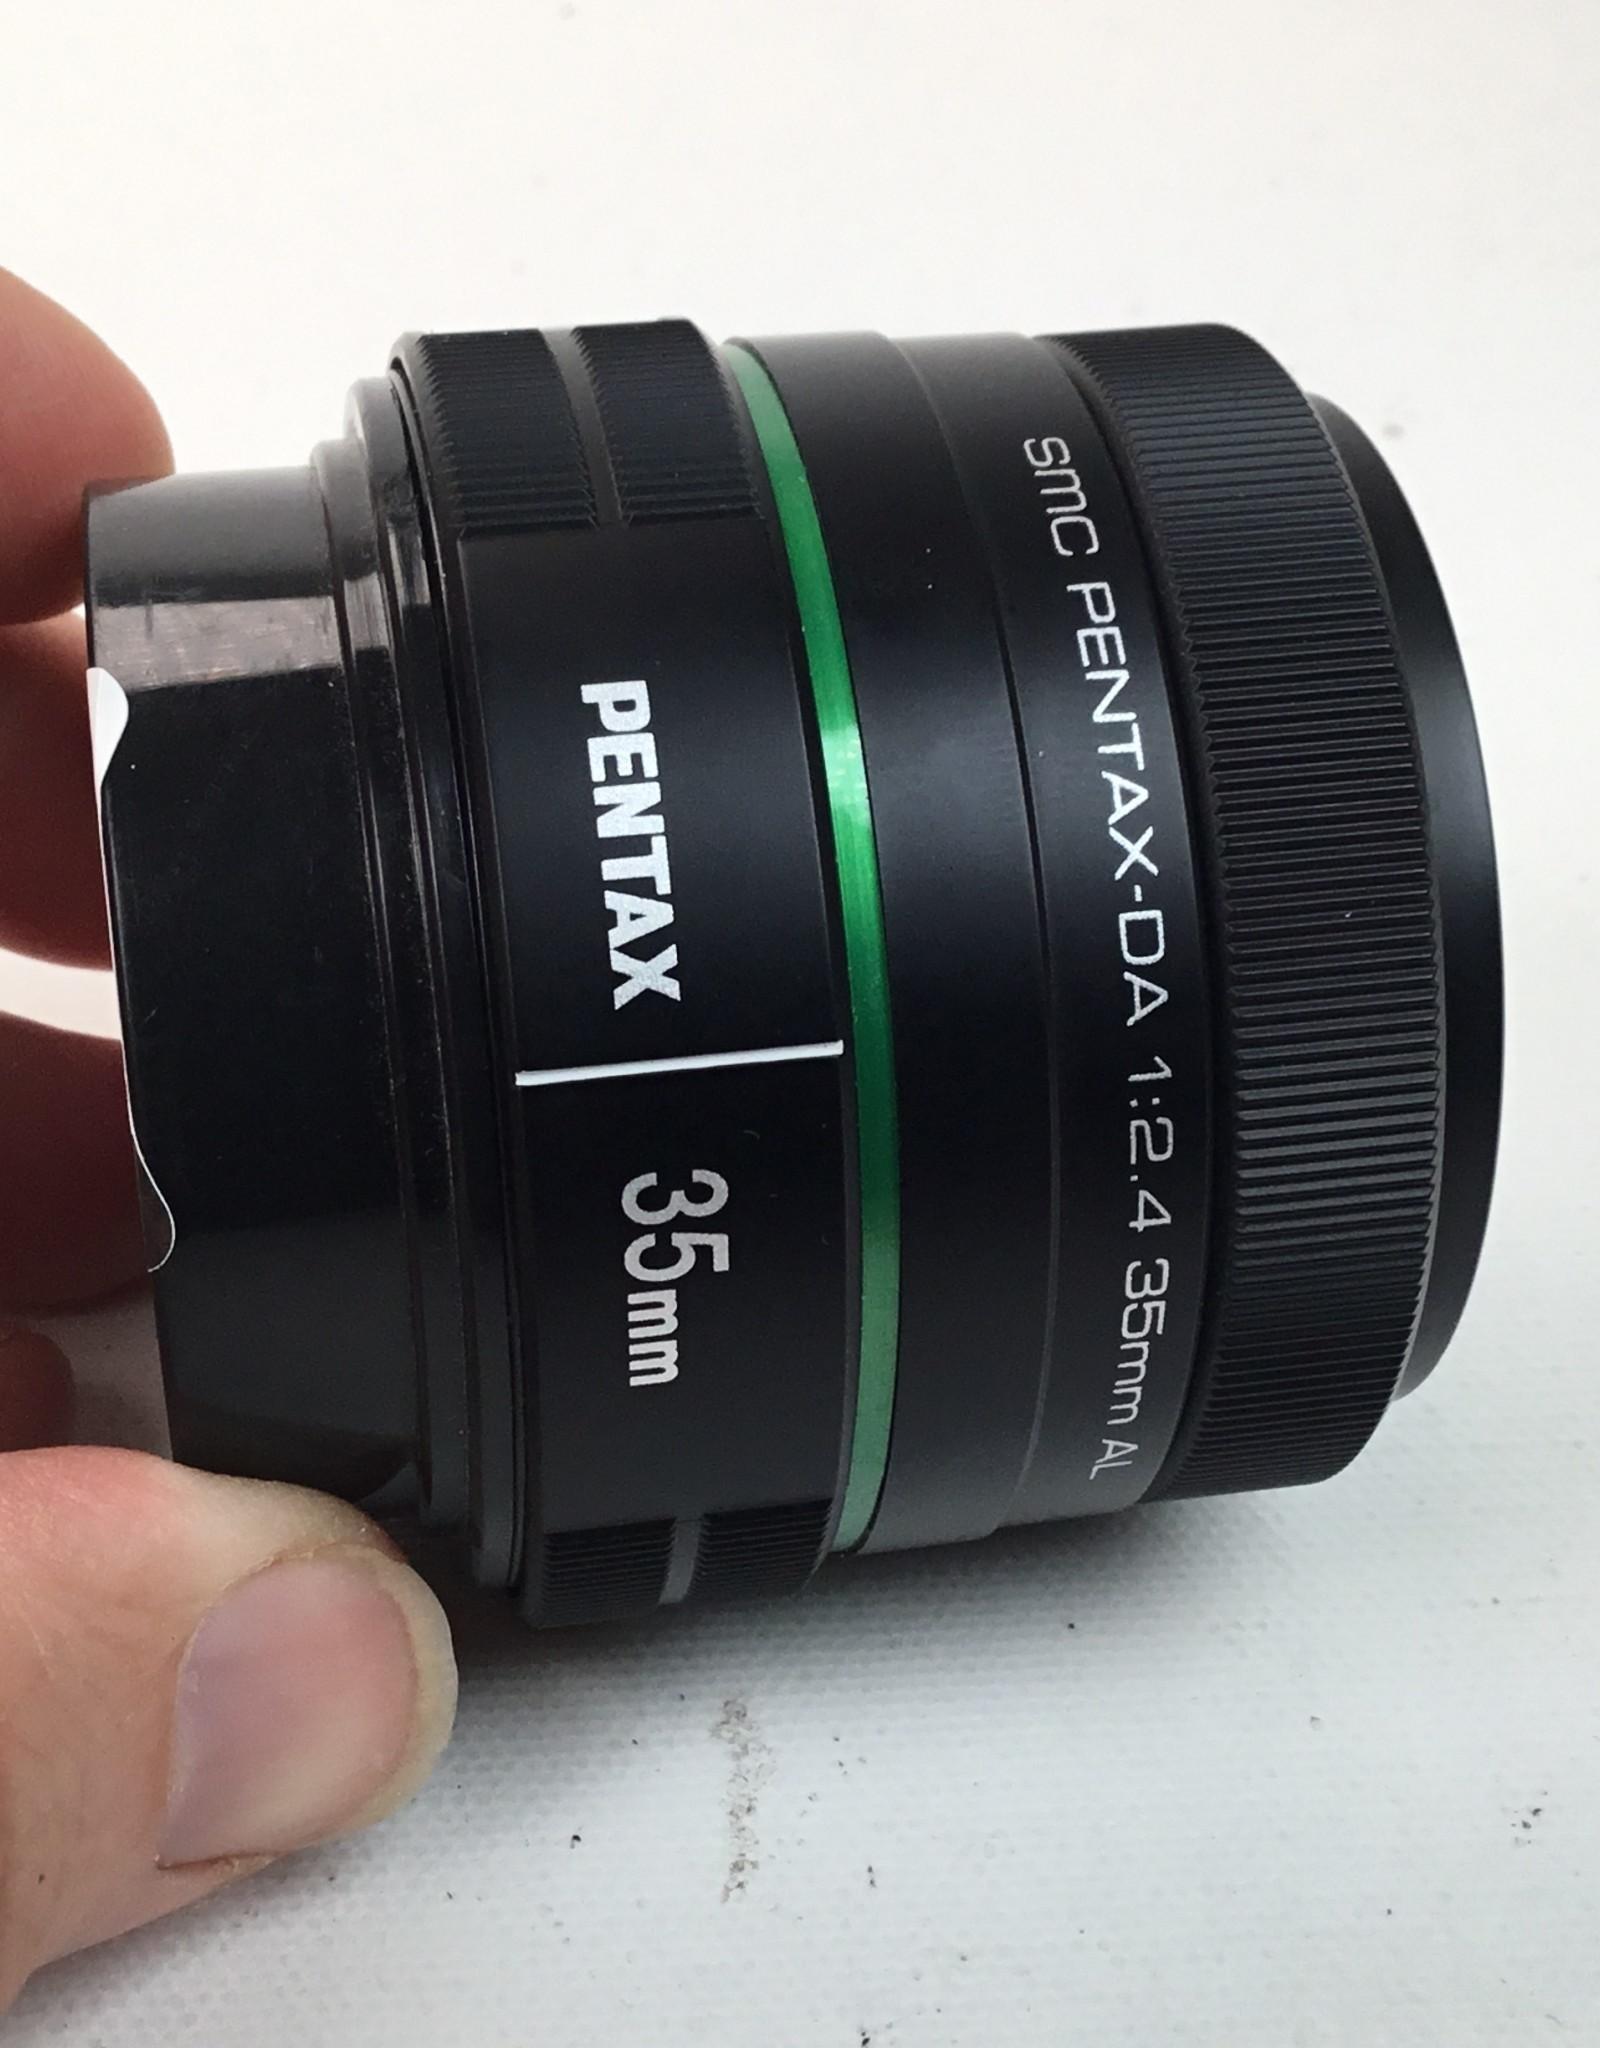 Pentax Pentax DA SMC 35mm f2.4 AL Lens Used EX